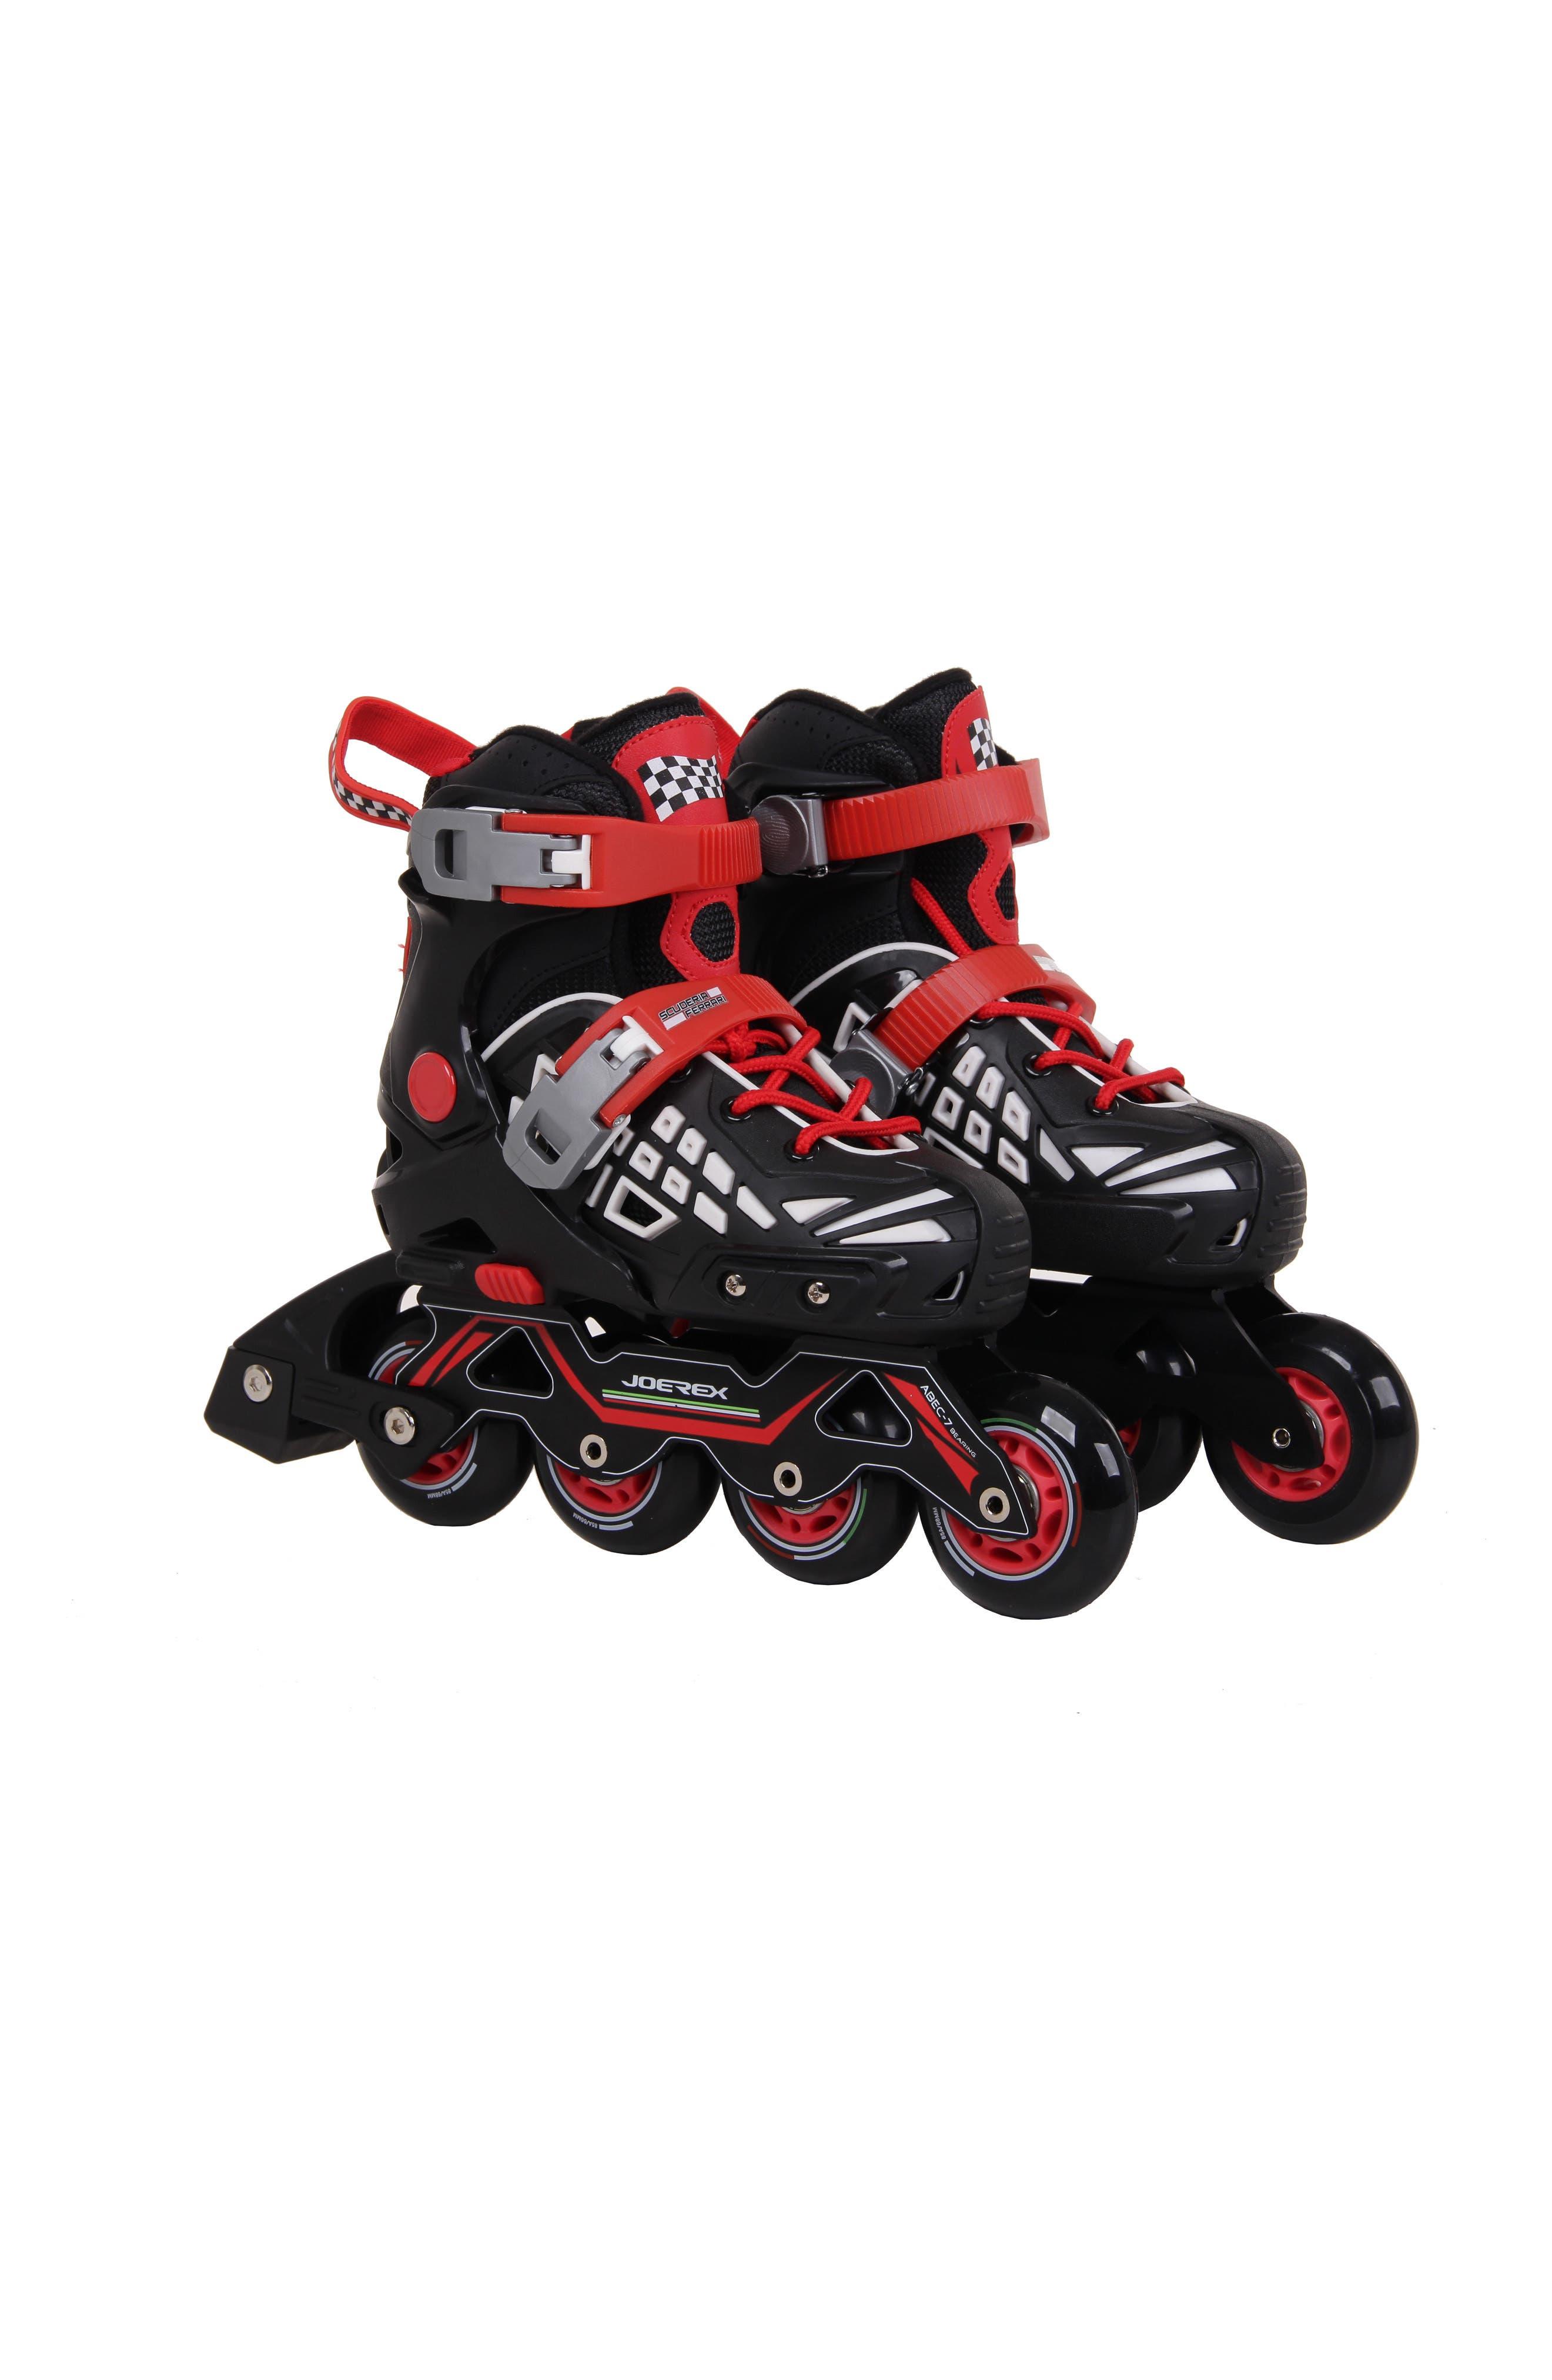 Slalom Inline Skates,                             Main thumbnail 1, color,                             Black